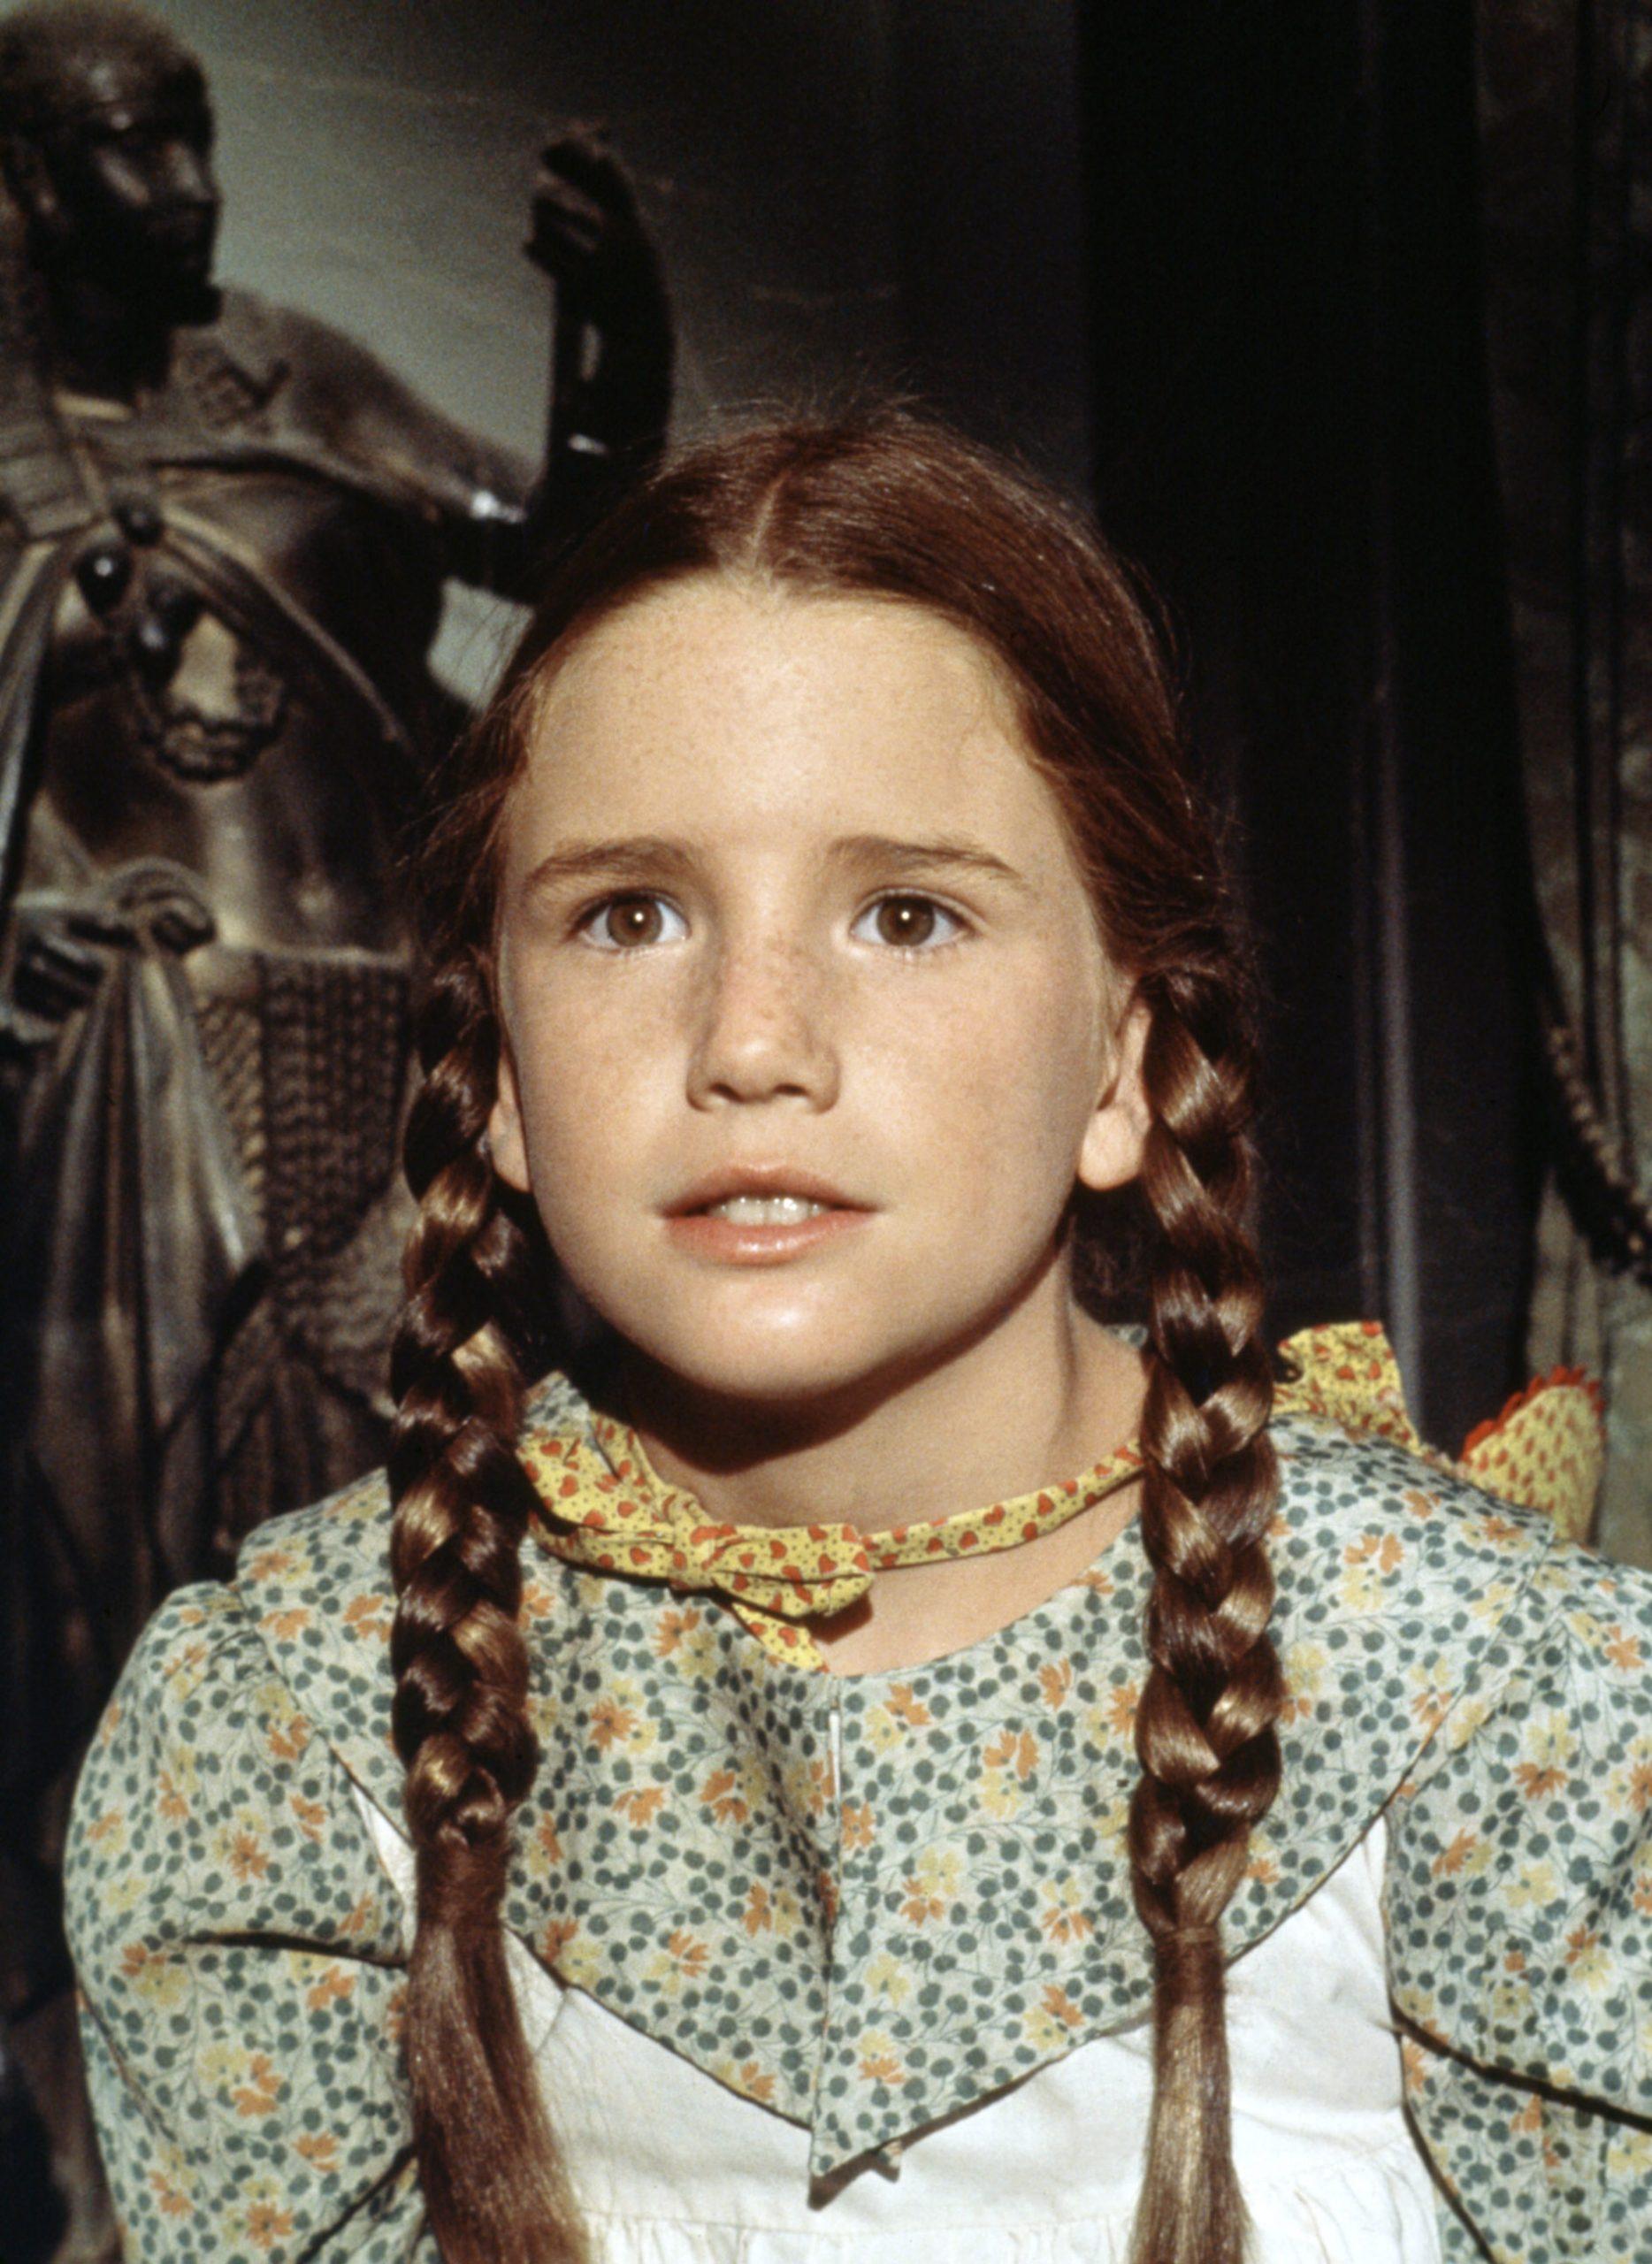 LITTLE HOUSE ON THE PRAIRIE, Melissa Gilbert, Season 2, 1974-1983